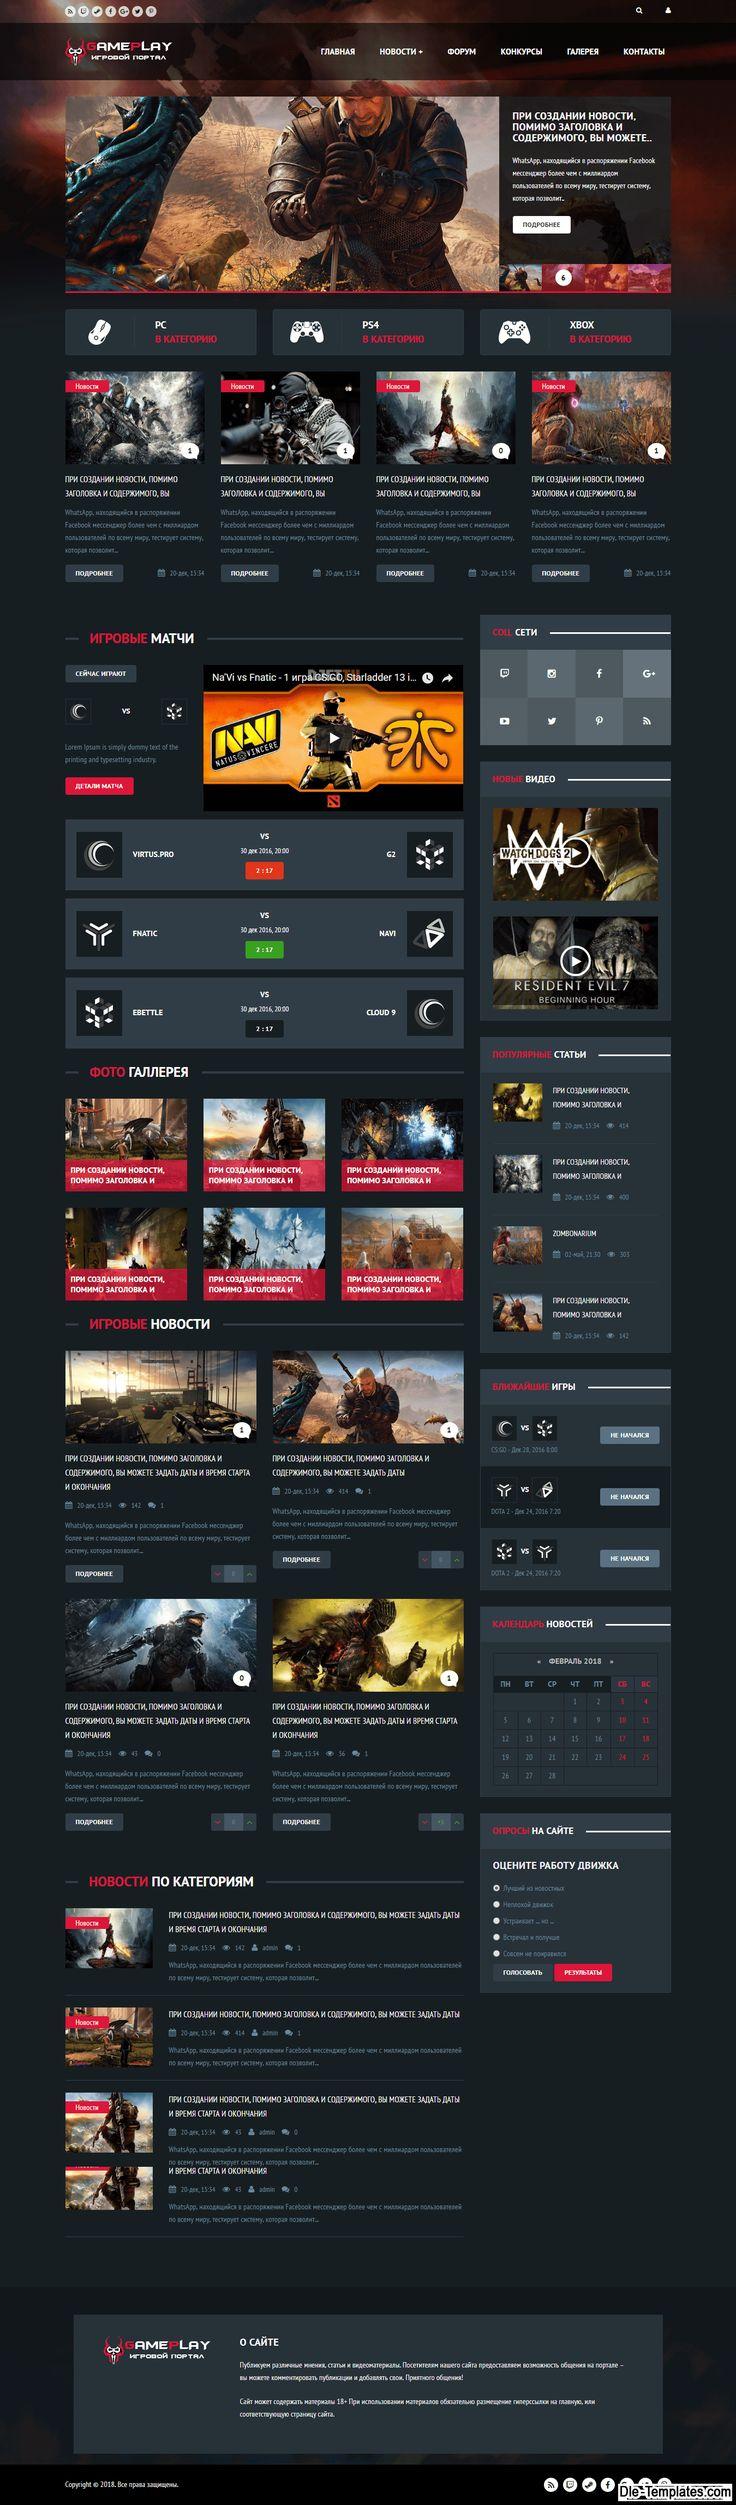 GamePlay - адаптивный игровой шаблон для DLE #templates #website #шаблон #сайт #web DataLife Engine (DLE)